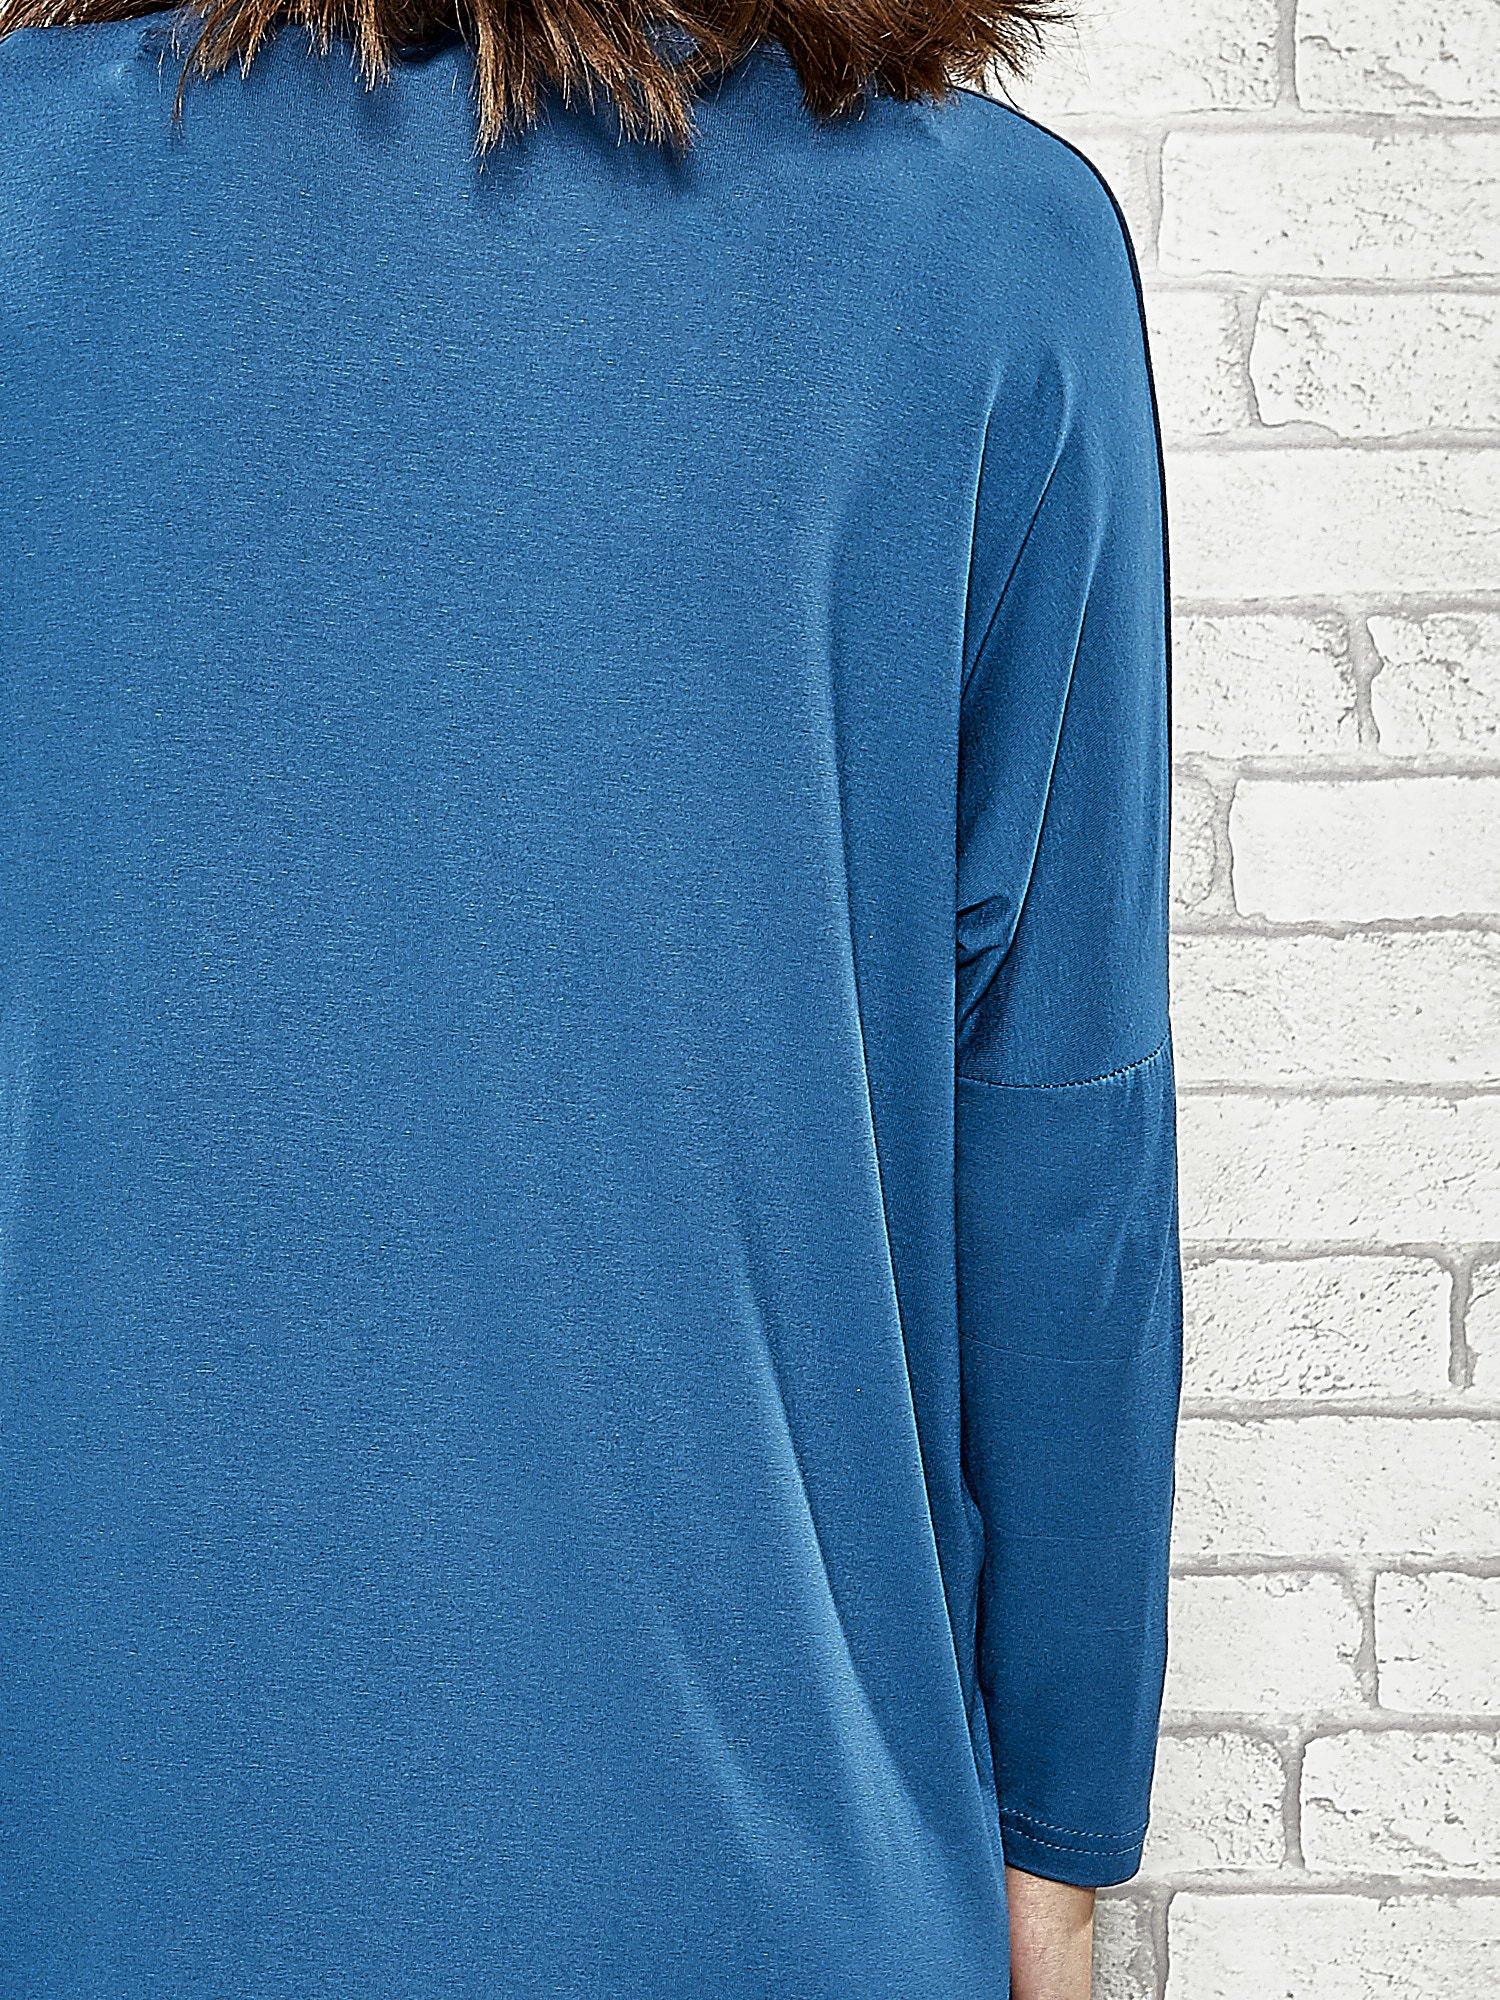 Niebieska sukienka ze złotym napisem UNIQUE                                  zdj.                                  6